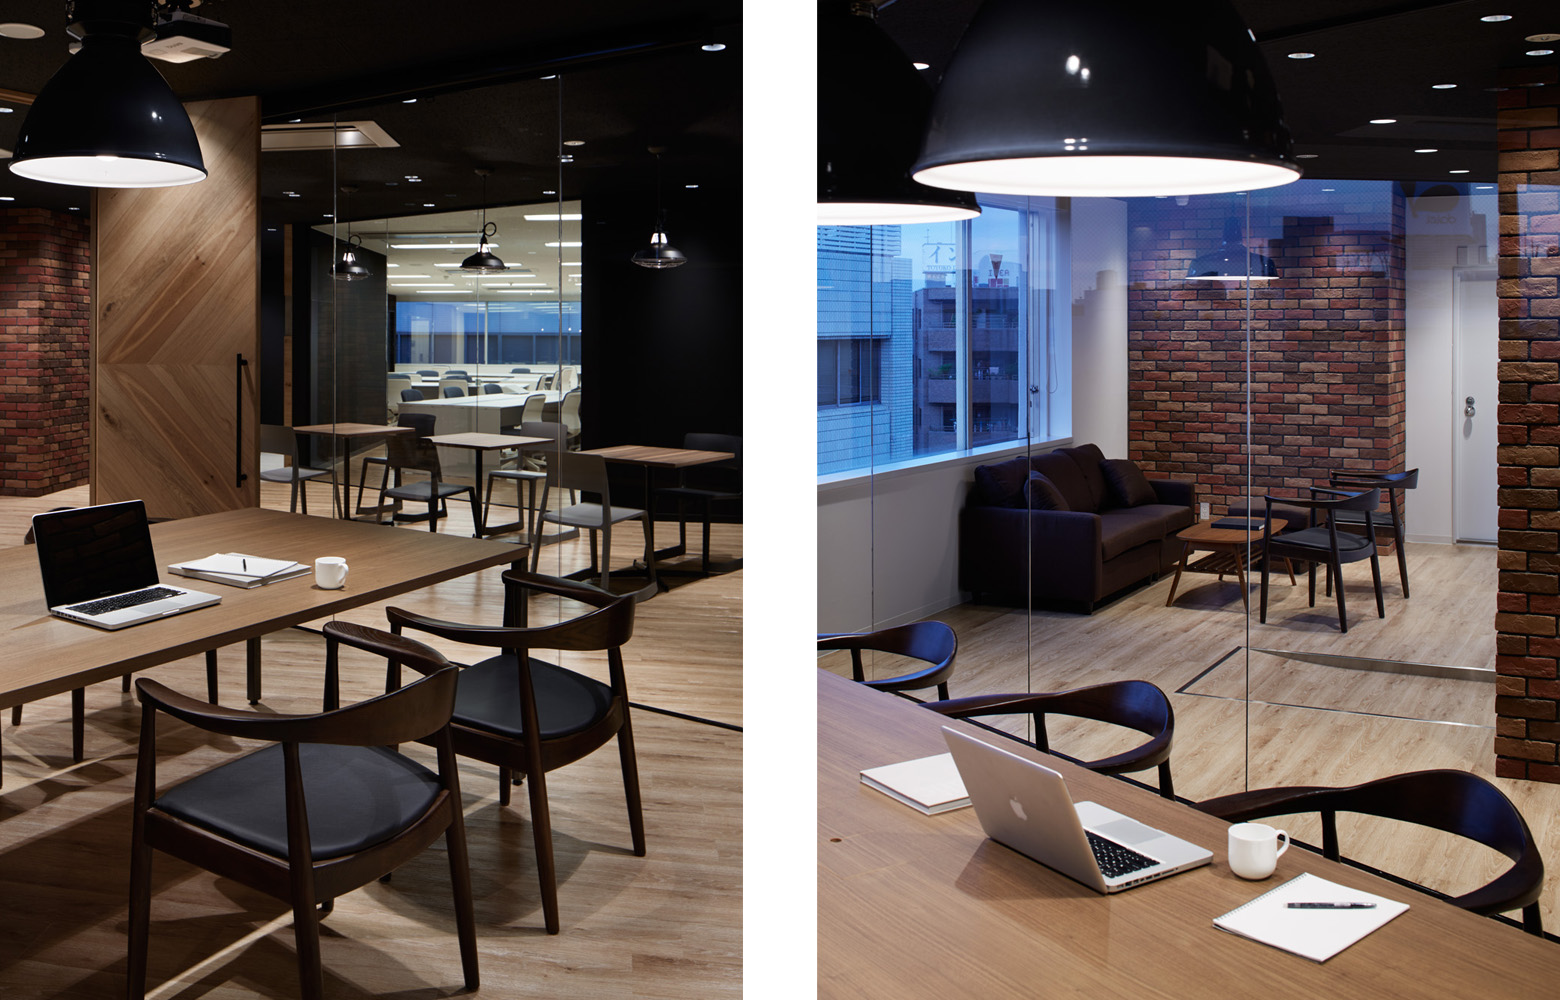 BEST株式会社 Meeting Space_3 デザイン・レイアウト事例